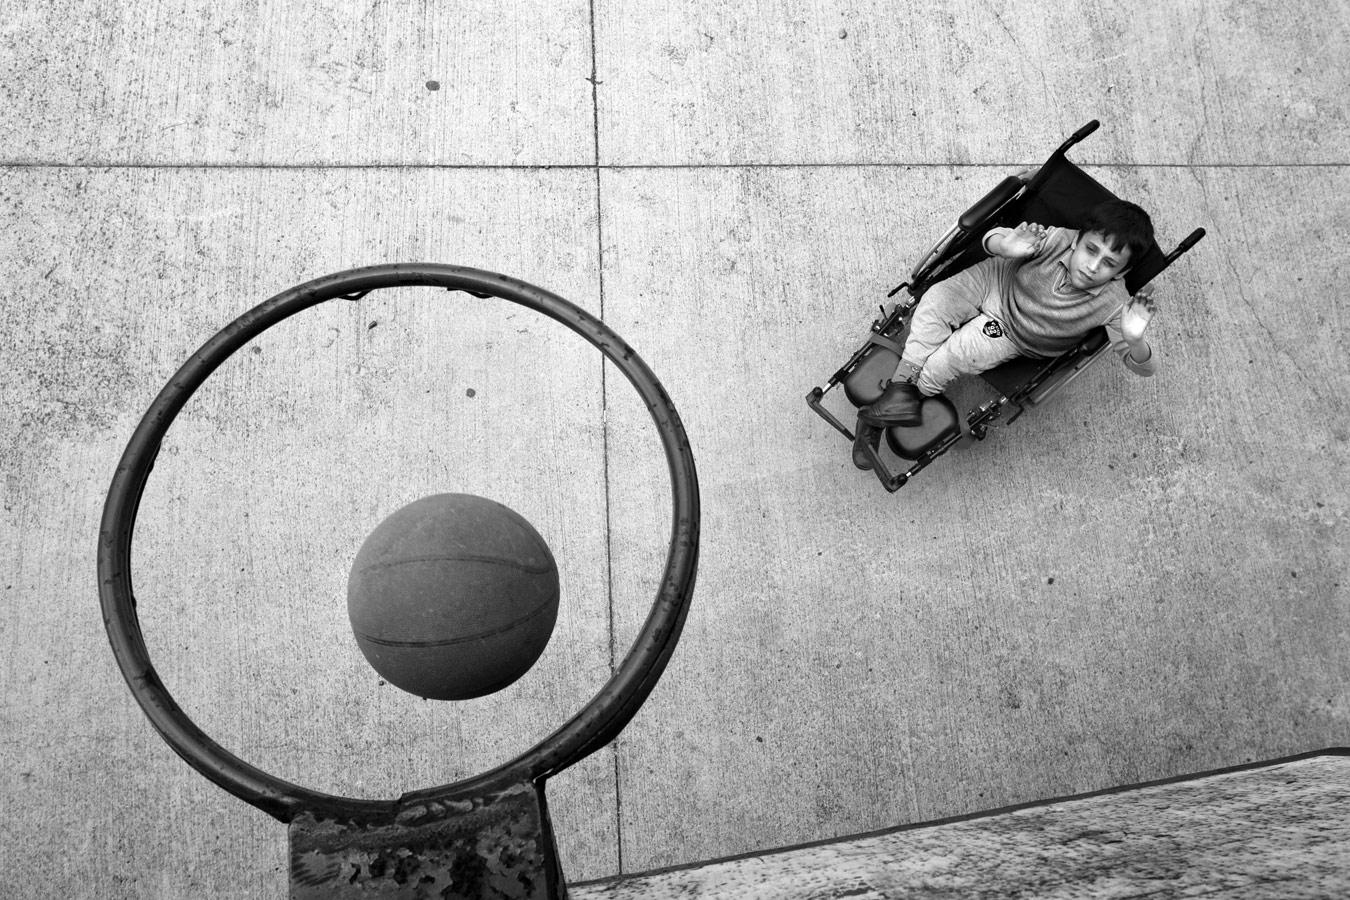 © Leyla Emektar, FIBA Photo Contest